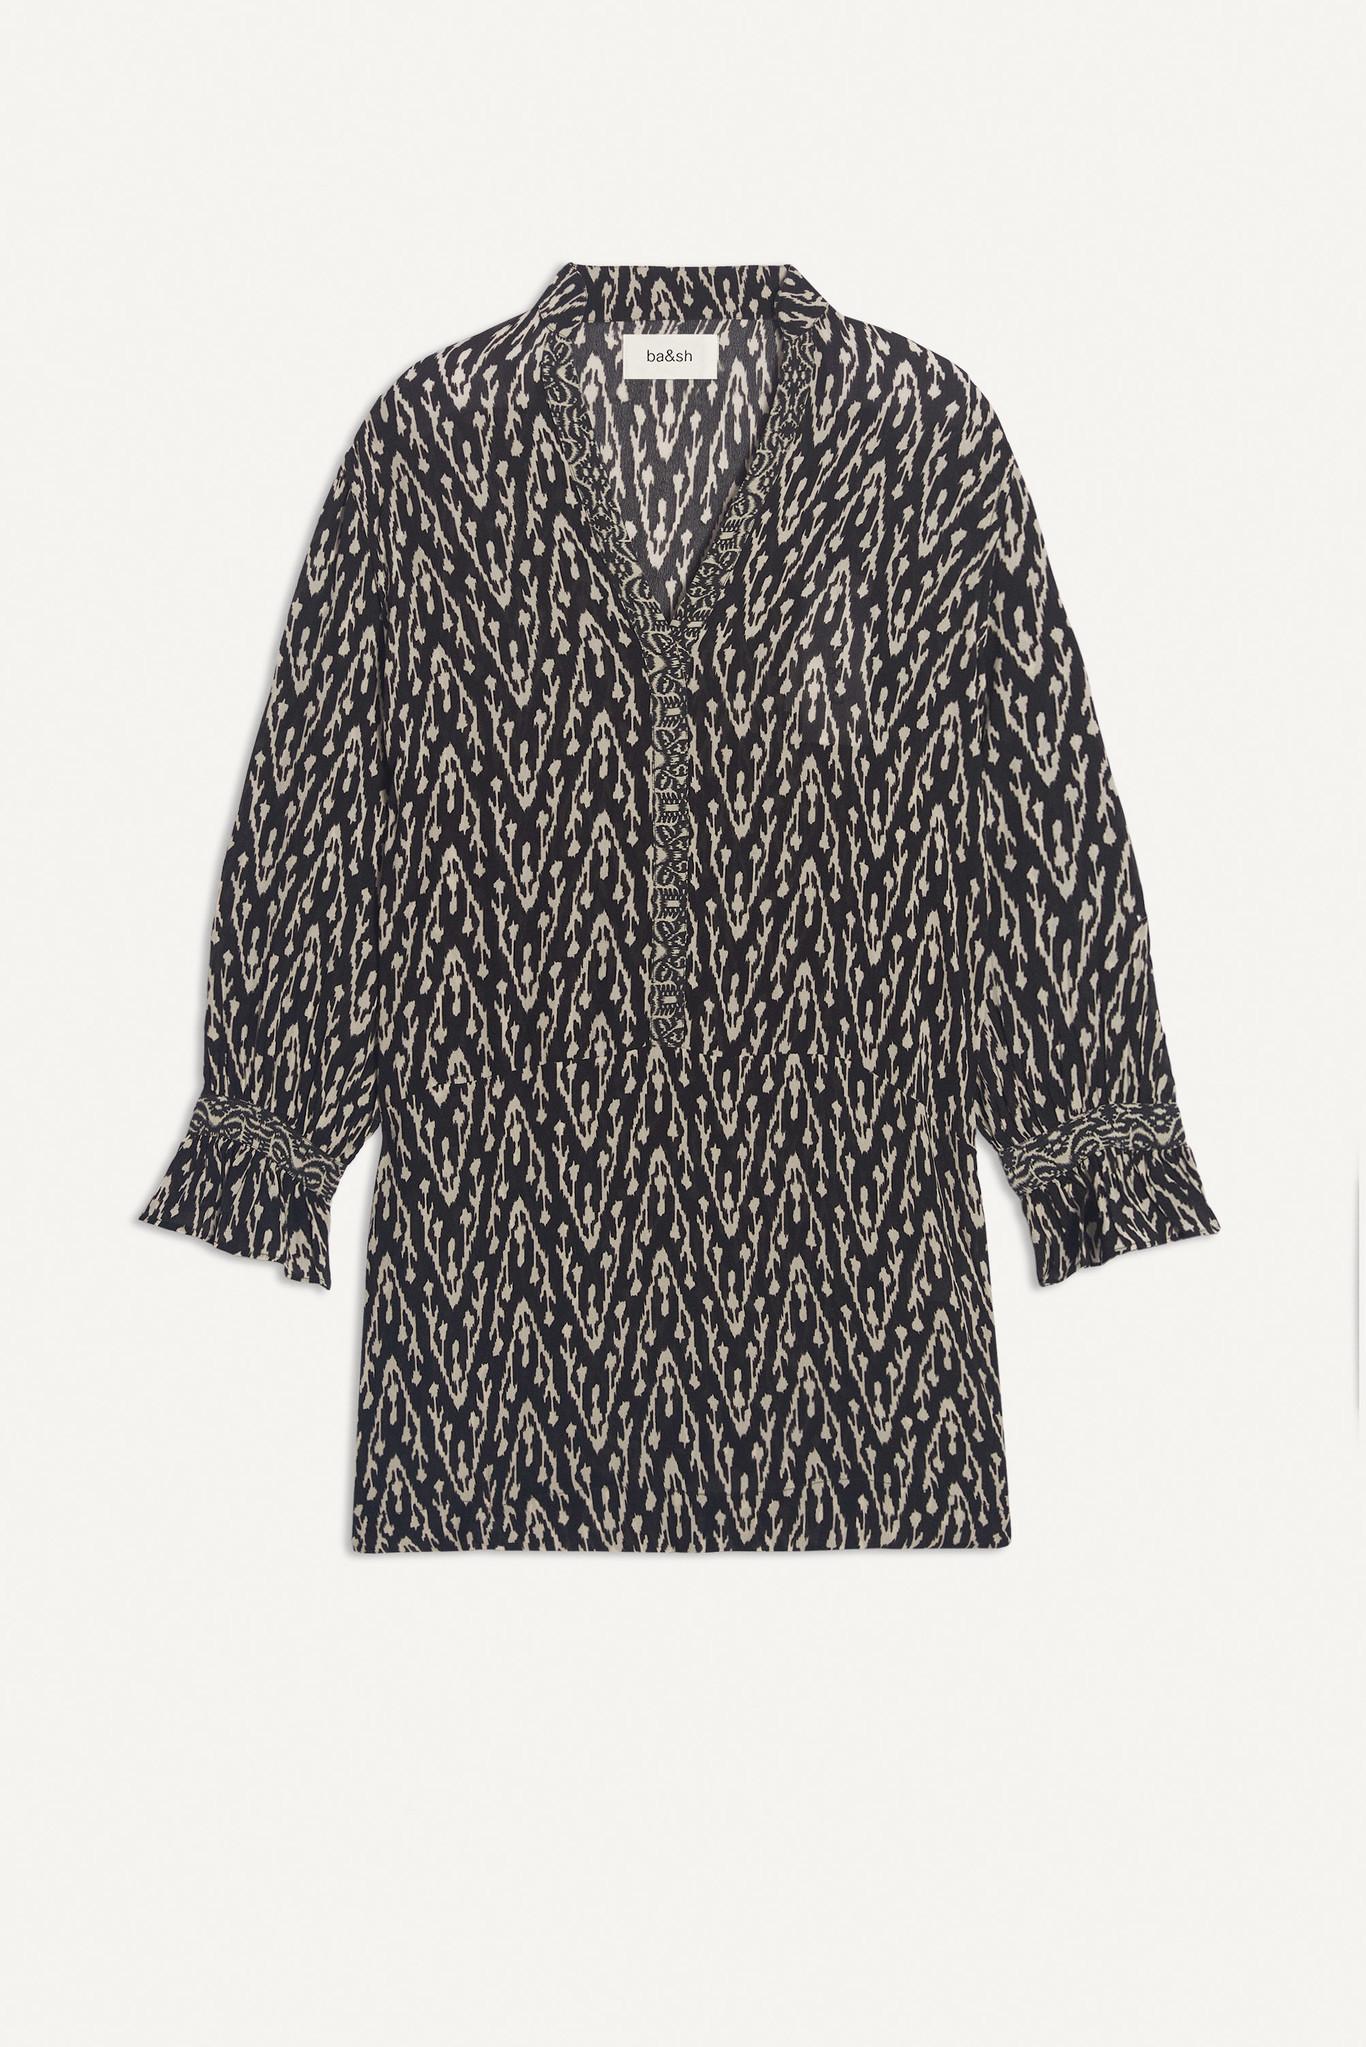 BA&SH robe isabora-1